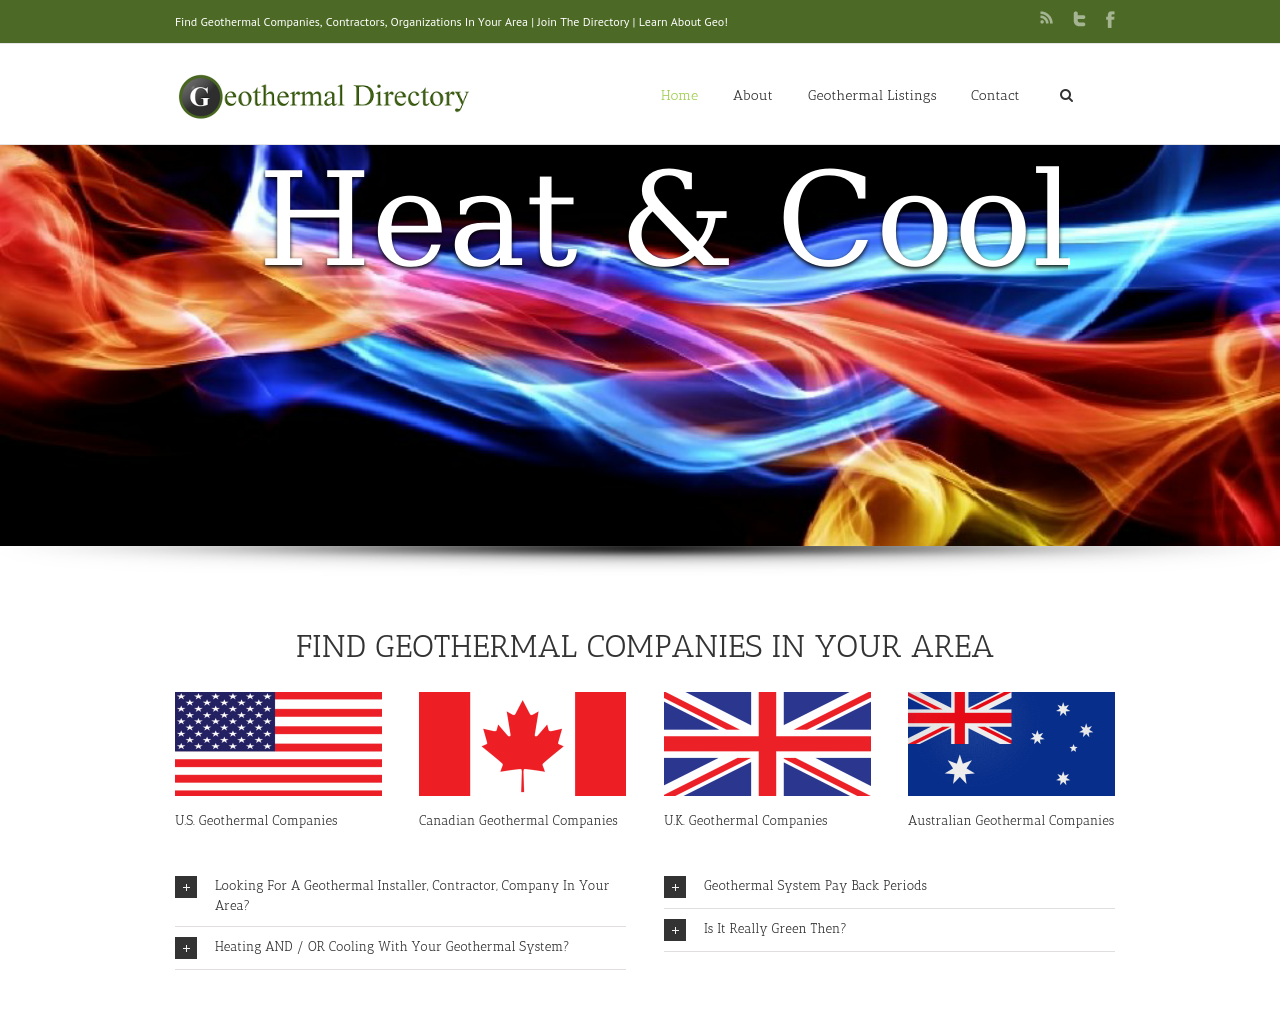 Geothermal-Directory-Advertising-Reviews-Pricing